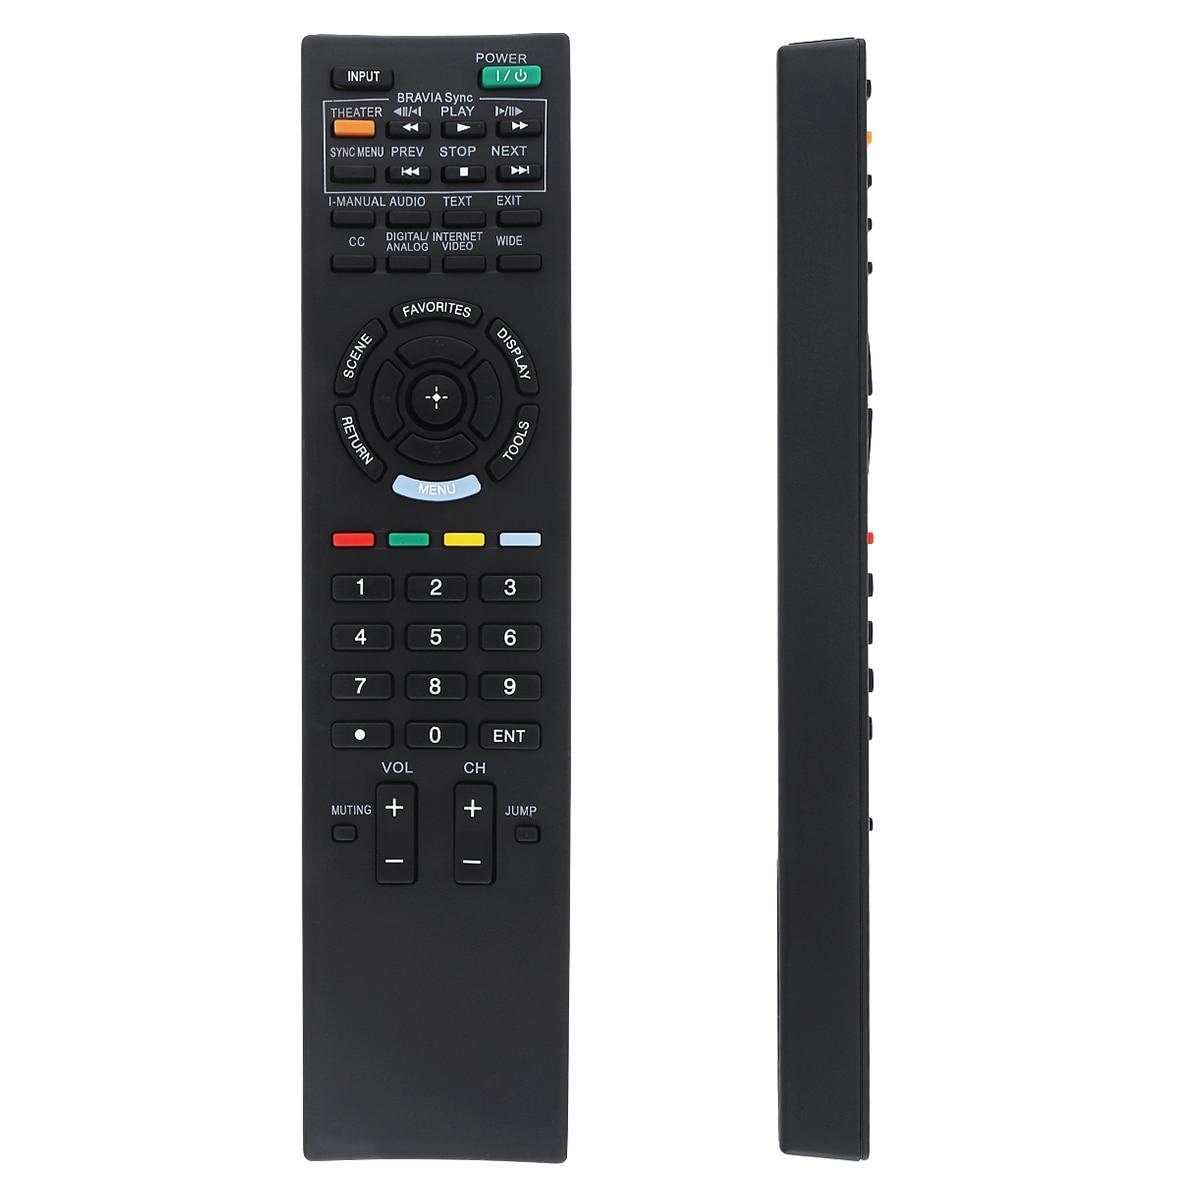 Mando a distancia Universal negro ABS 433MHz de repuesto IR TV con Larga Distancia de Transmisión de 10M apto para SONY RM-ED022 TV